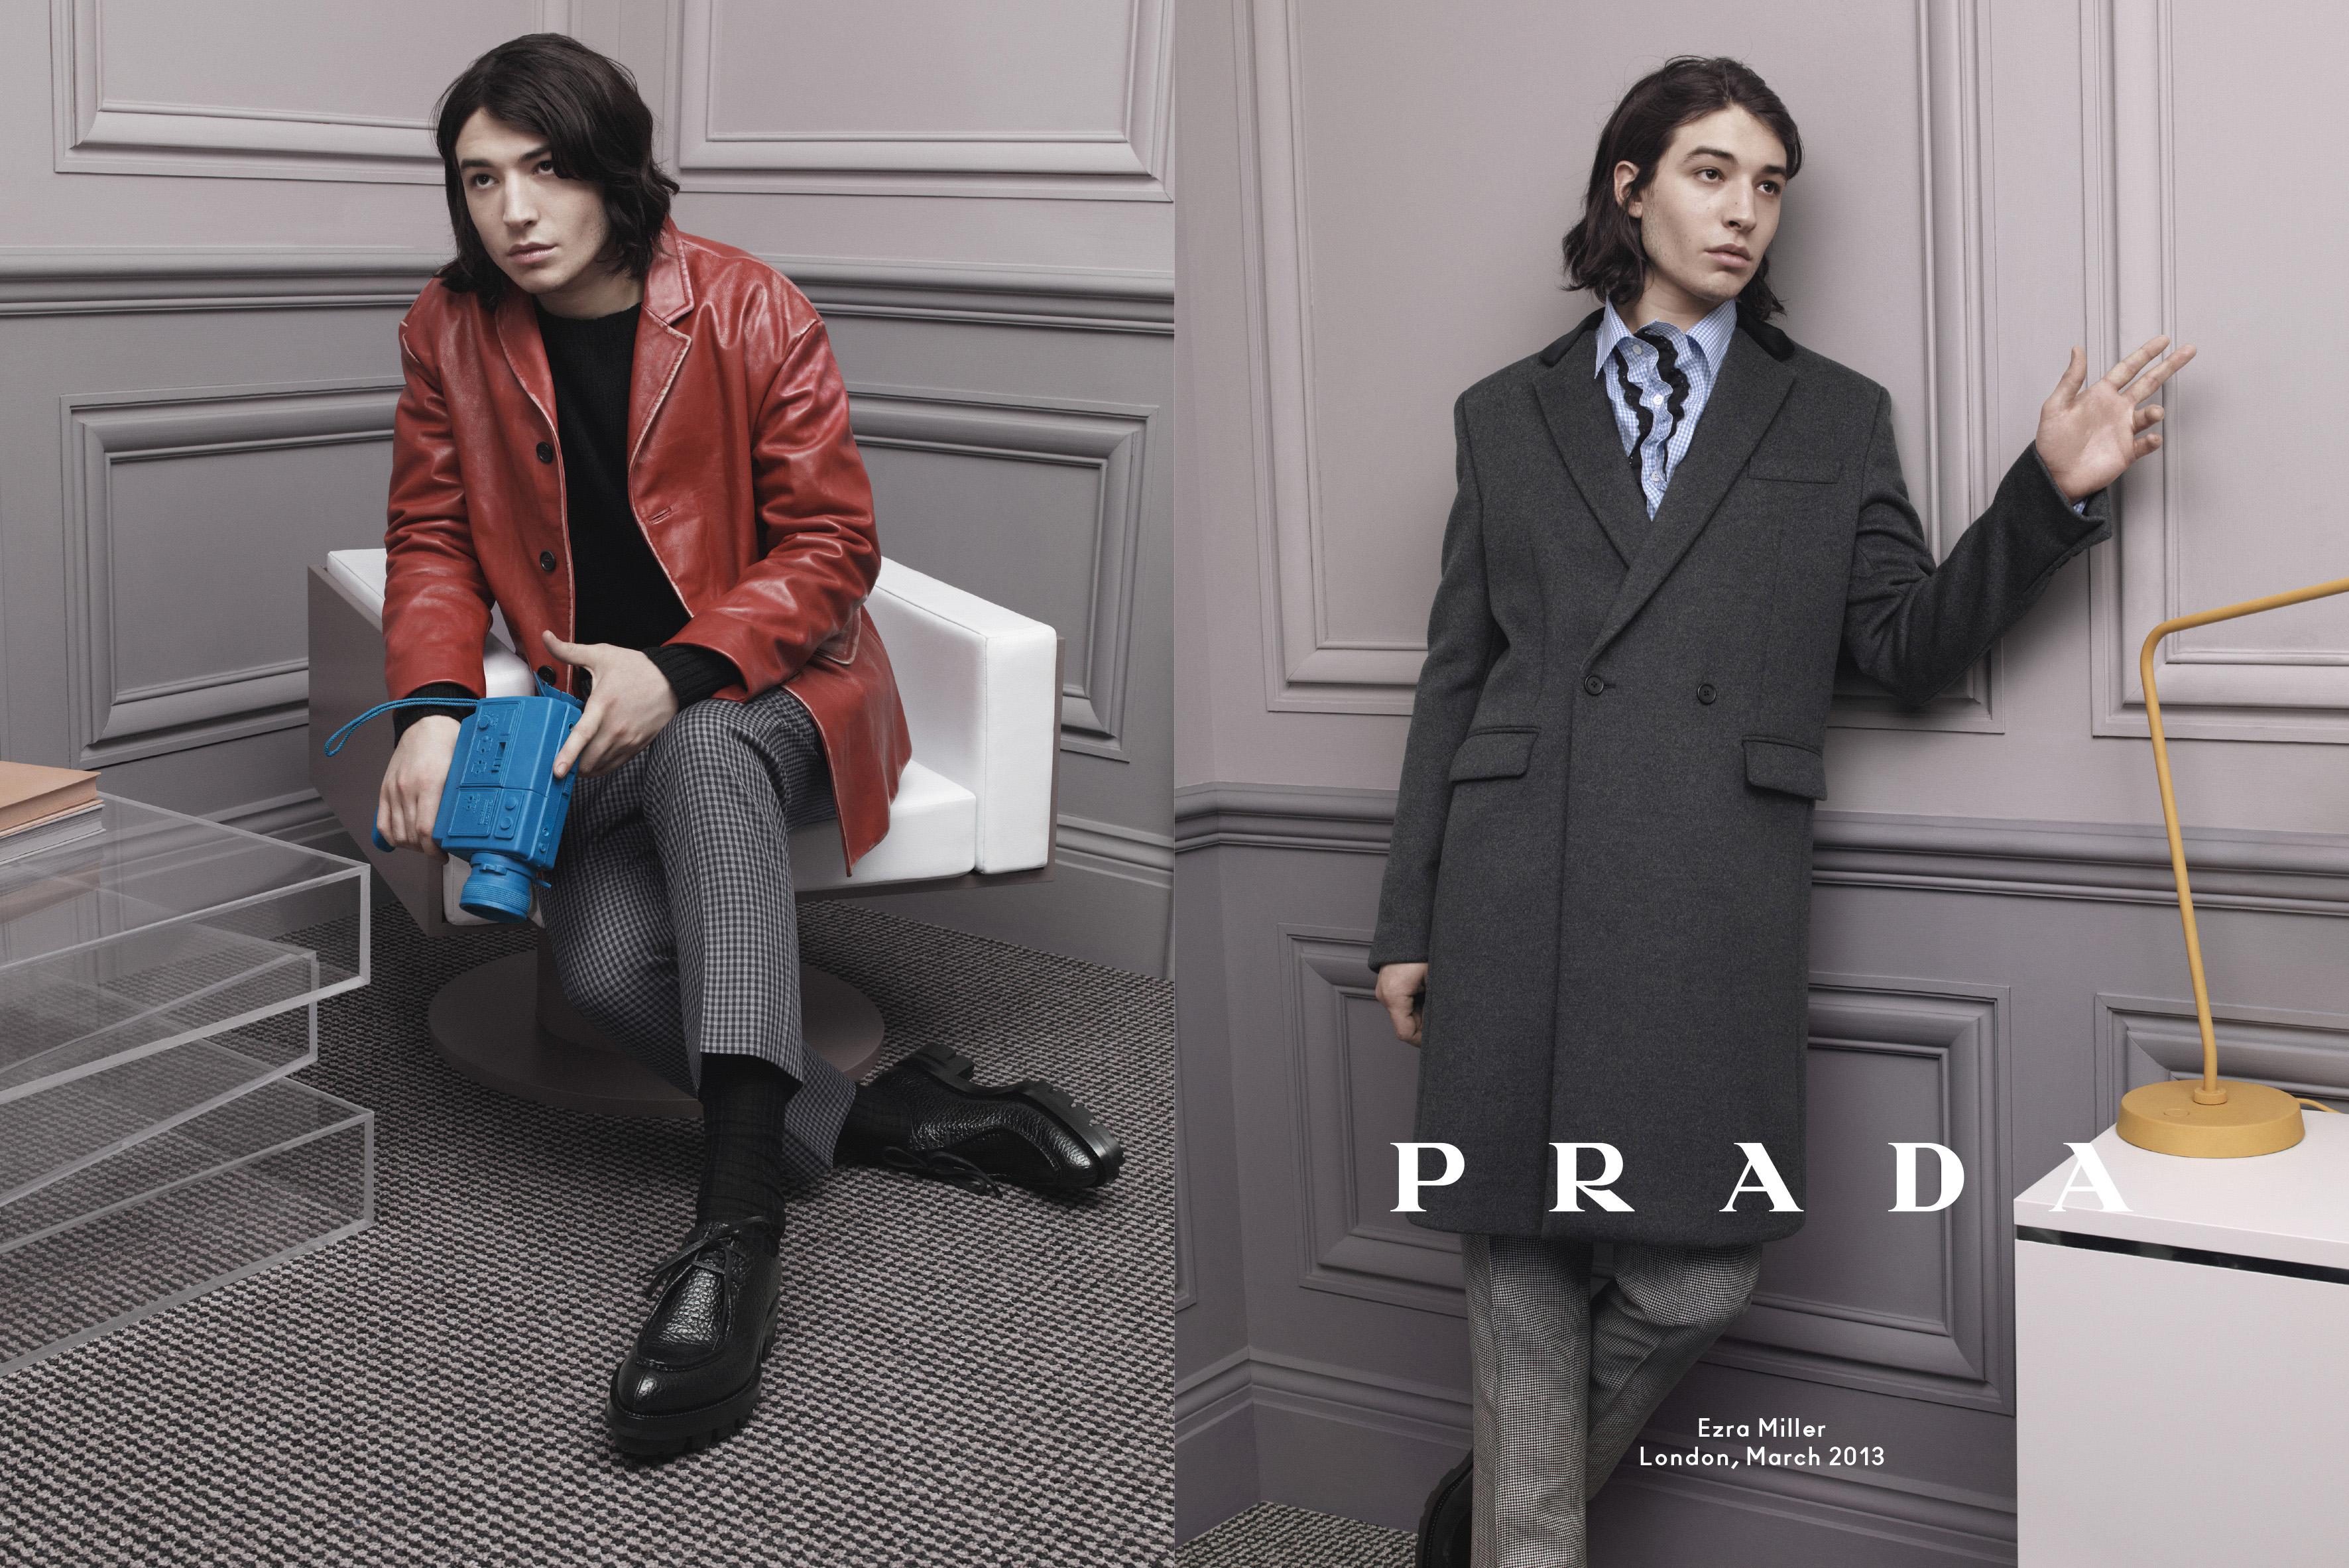 Prada_Menswear_FW13_Campaign_Ezra Miller